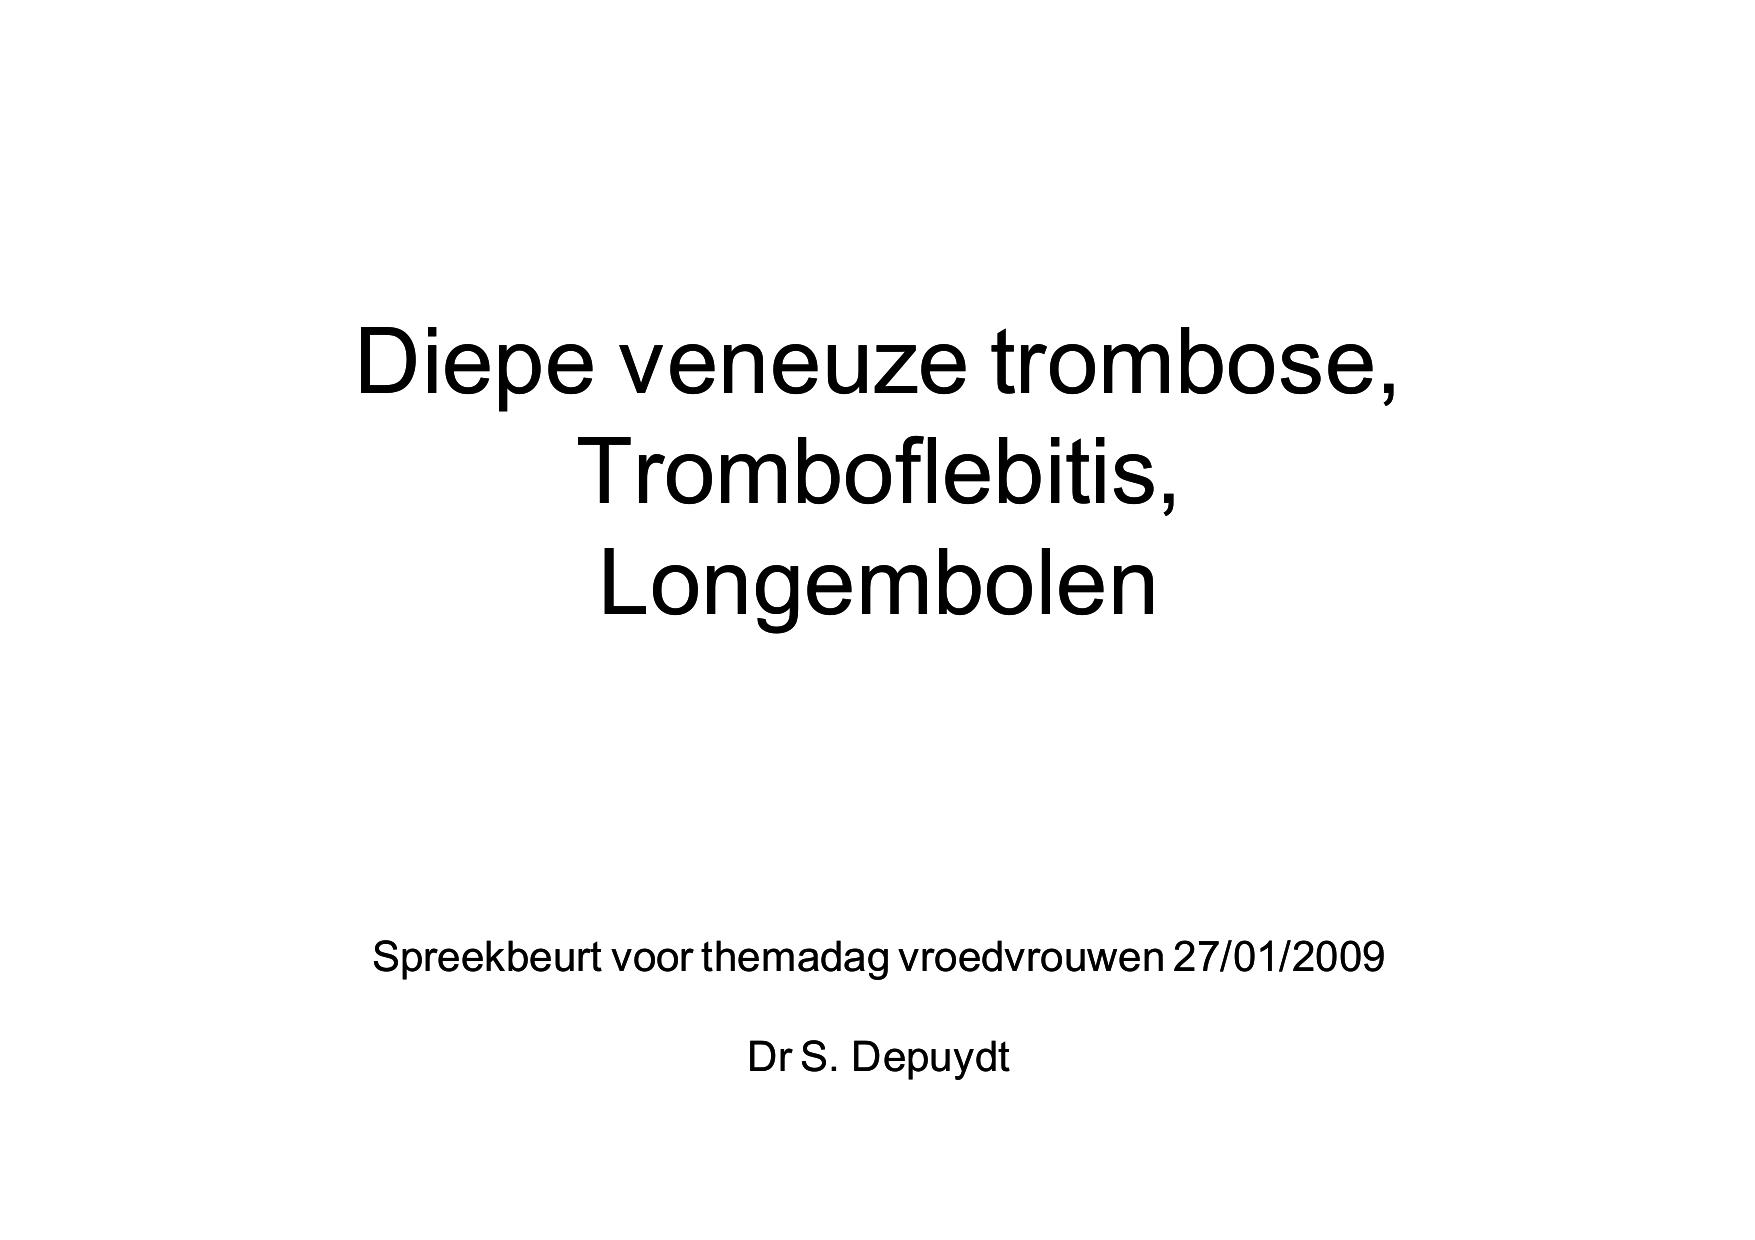 Diepe veneuze trombose, Tromboflebitis, Longembolen